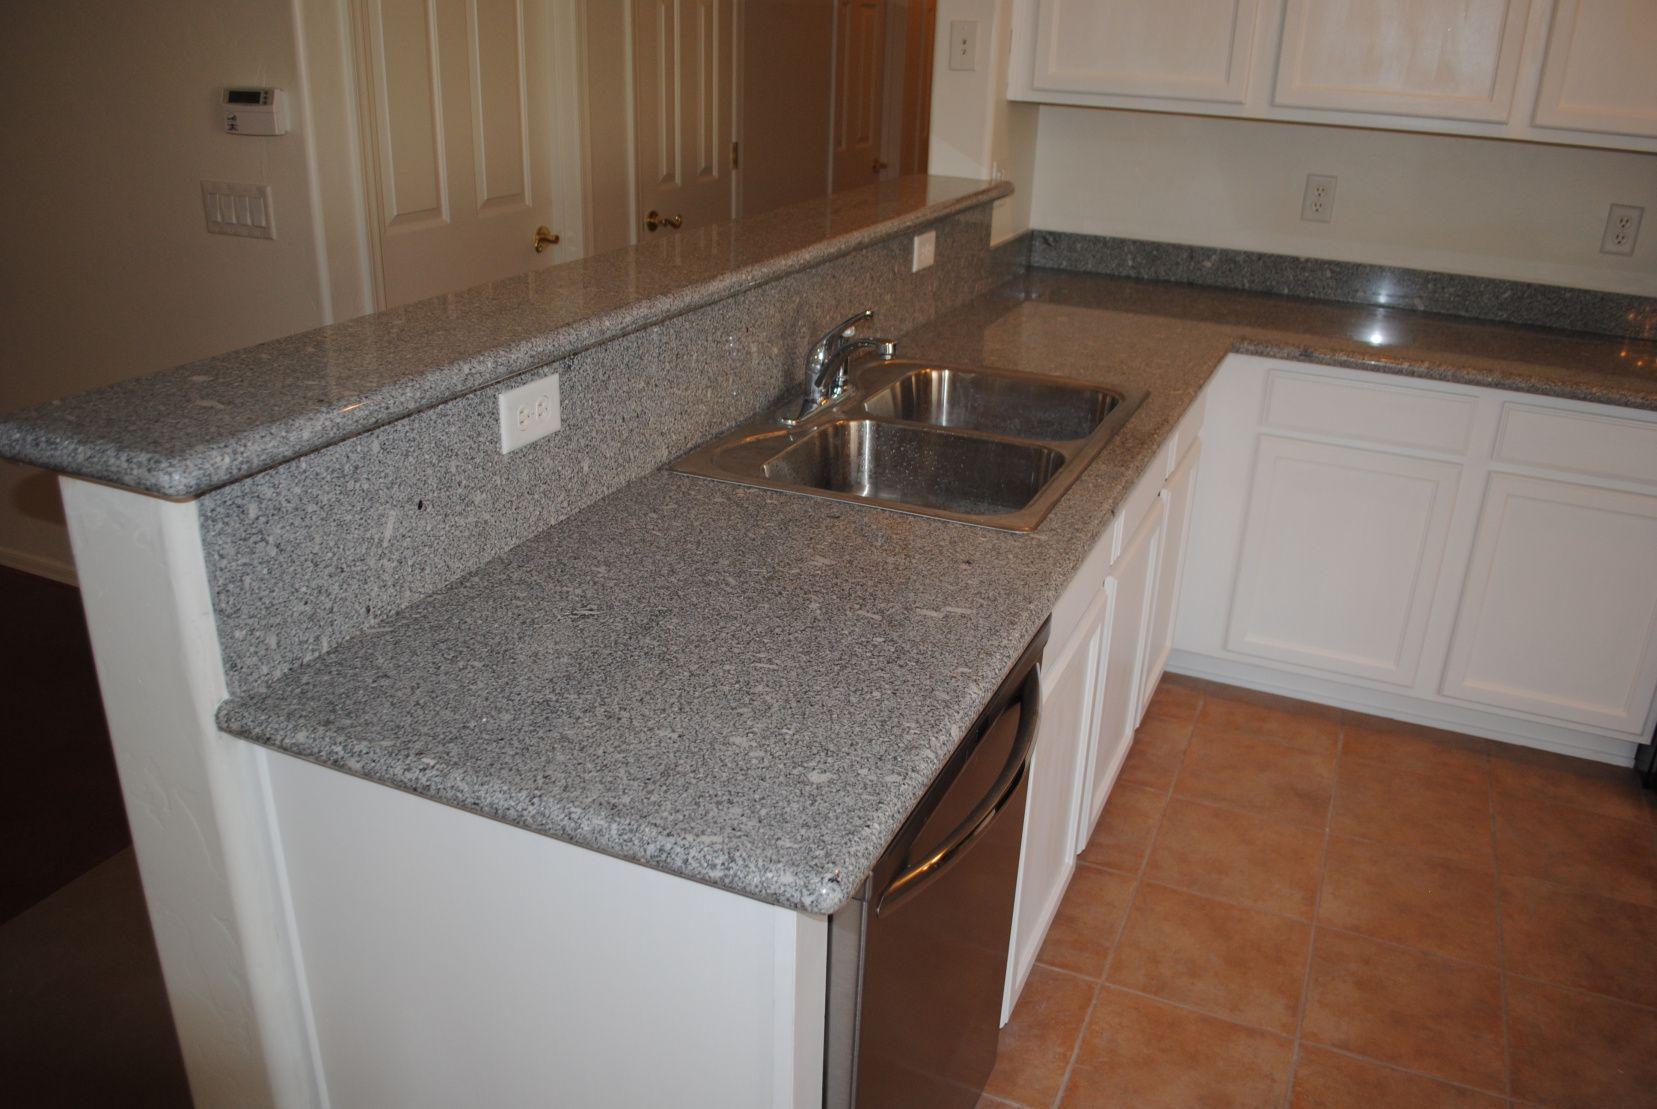 77 Salt And Pepper Granite Countertops Kitchen Decor Theme Ideas Check More At Http Kitchen Island Countertop Granite Countertops Kitchen Island Countertops